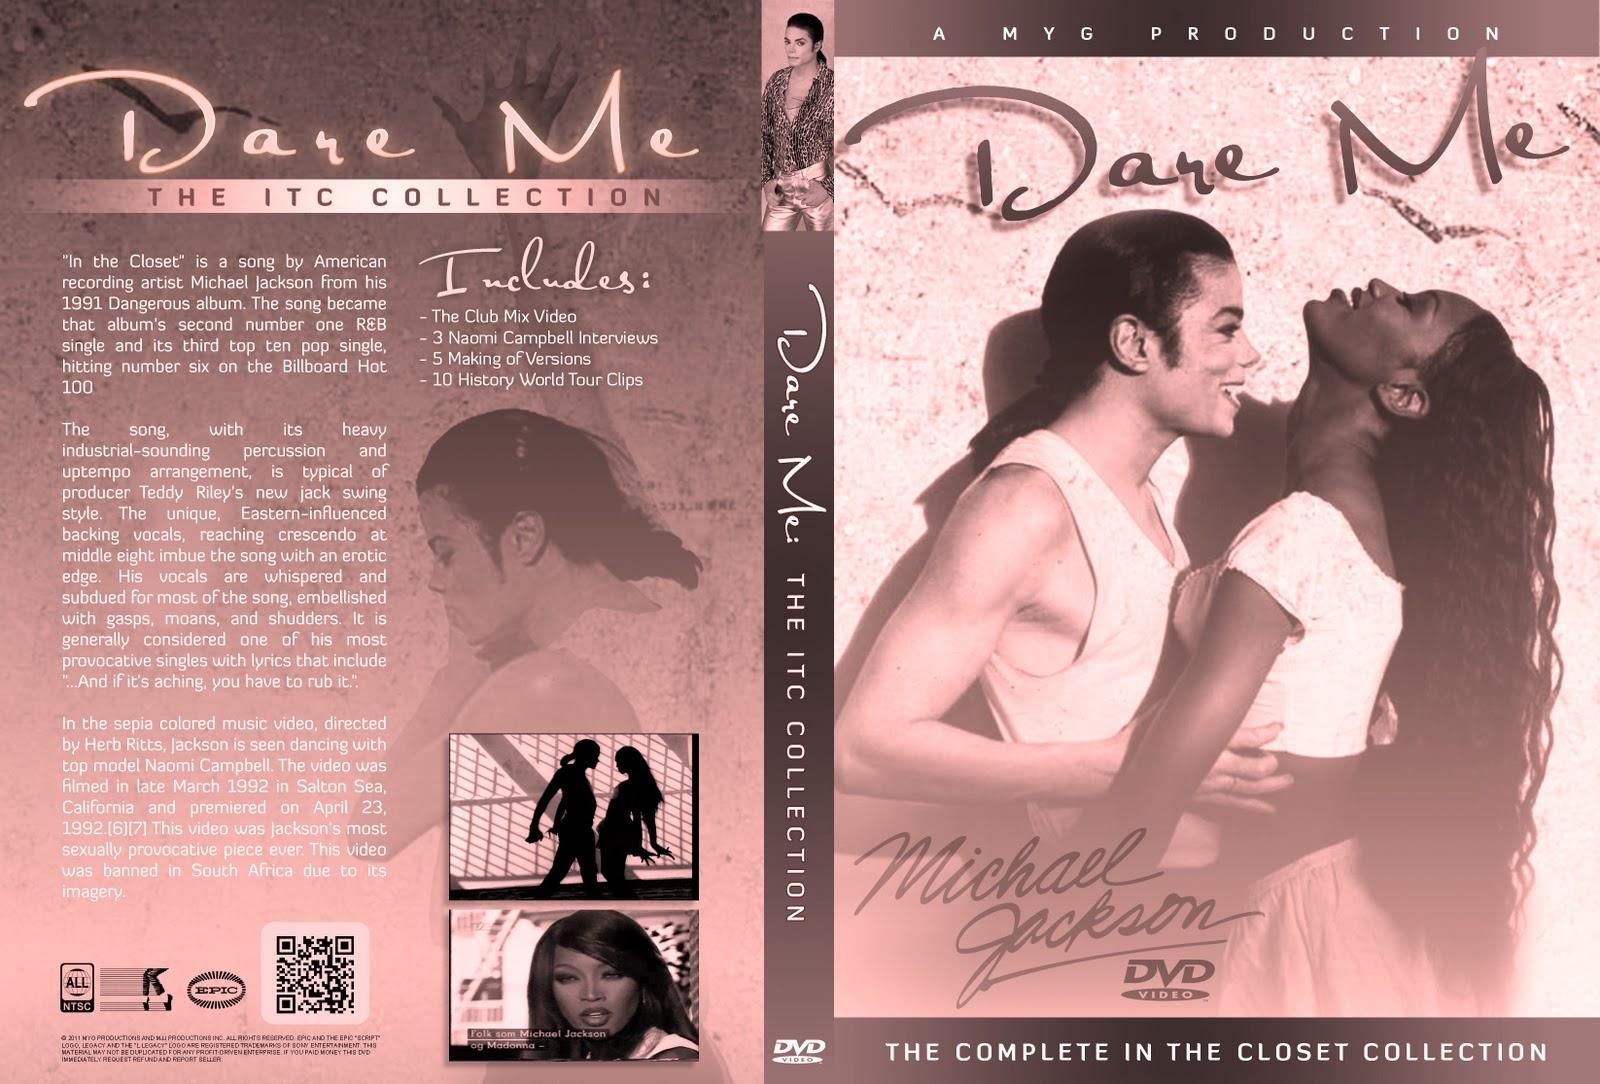 http://3.bp.blogspot.com/-isResbRpGVU/TvcYNGA1w5I/AAAAAAAABYM/G_dcABpGRT4/s1600/dare_me_dvd_case_cover.jpg